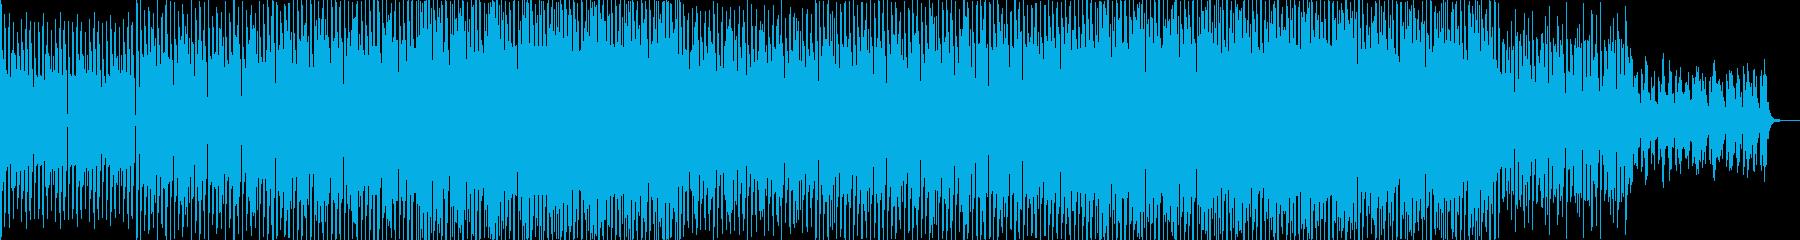 EDMドラマチックなテクノミュージックの再生済みの波形